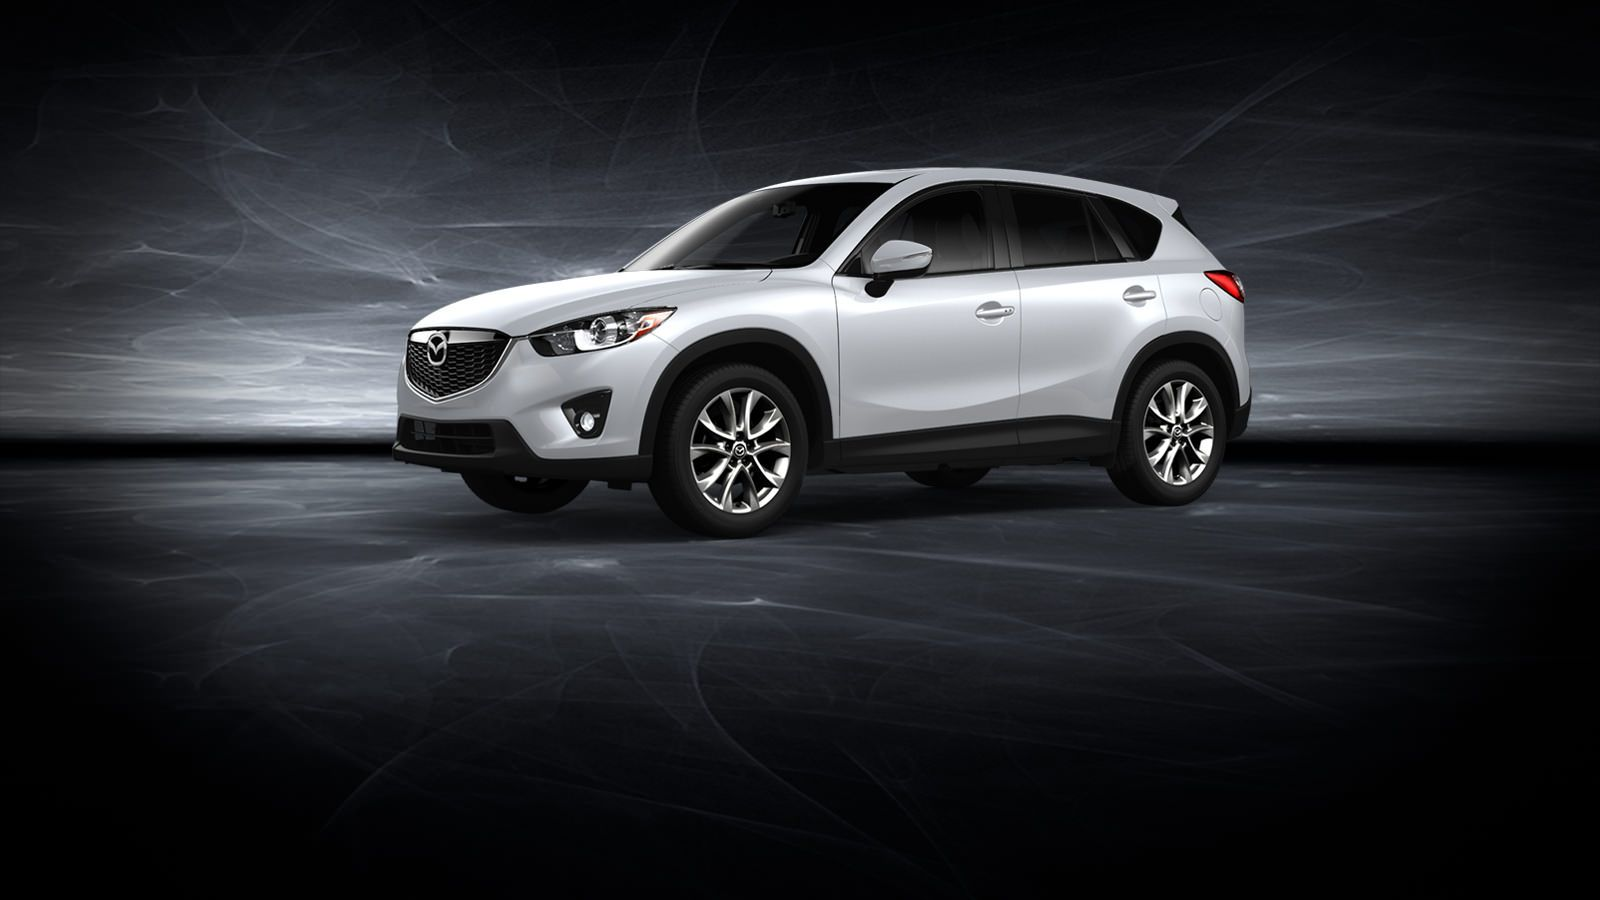 2015 Mazda Cx 5 Mazda Usa Mazda Good Looking Cars